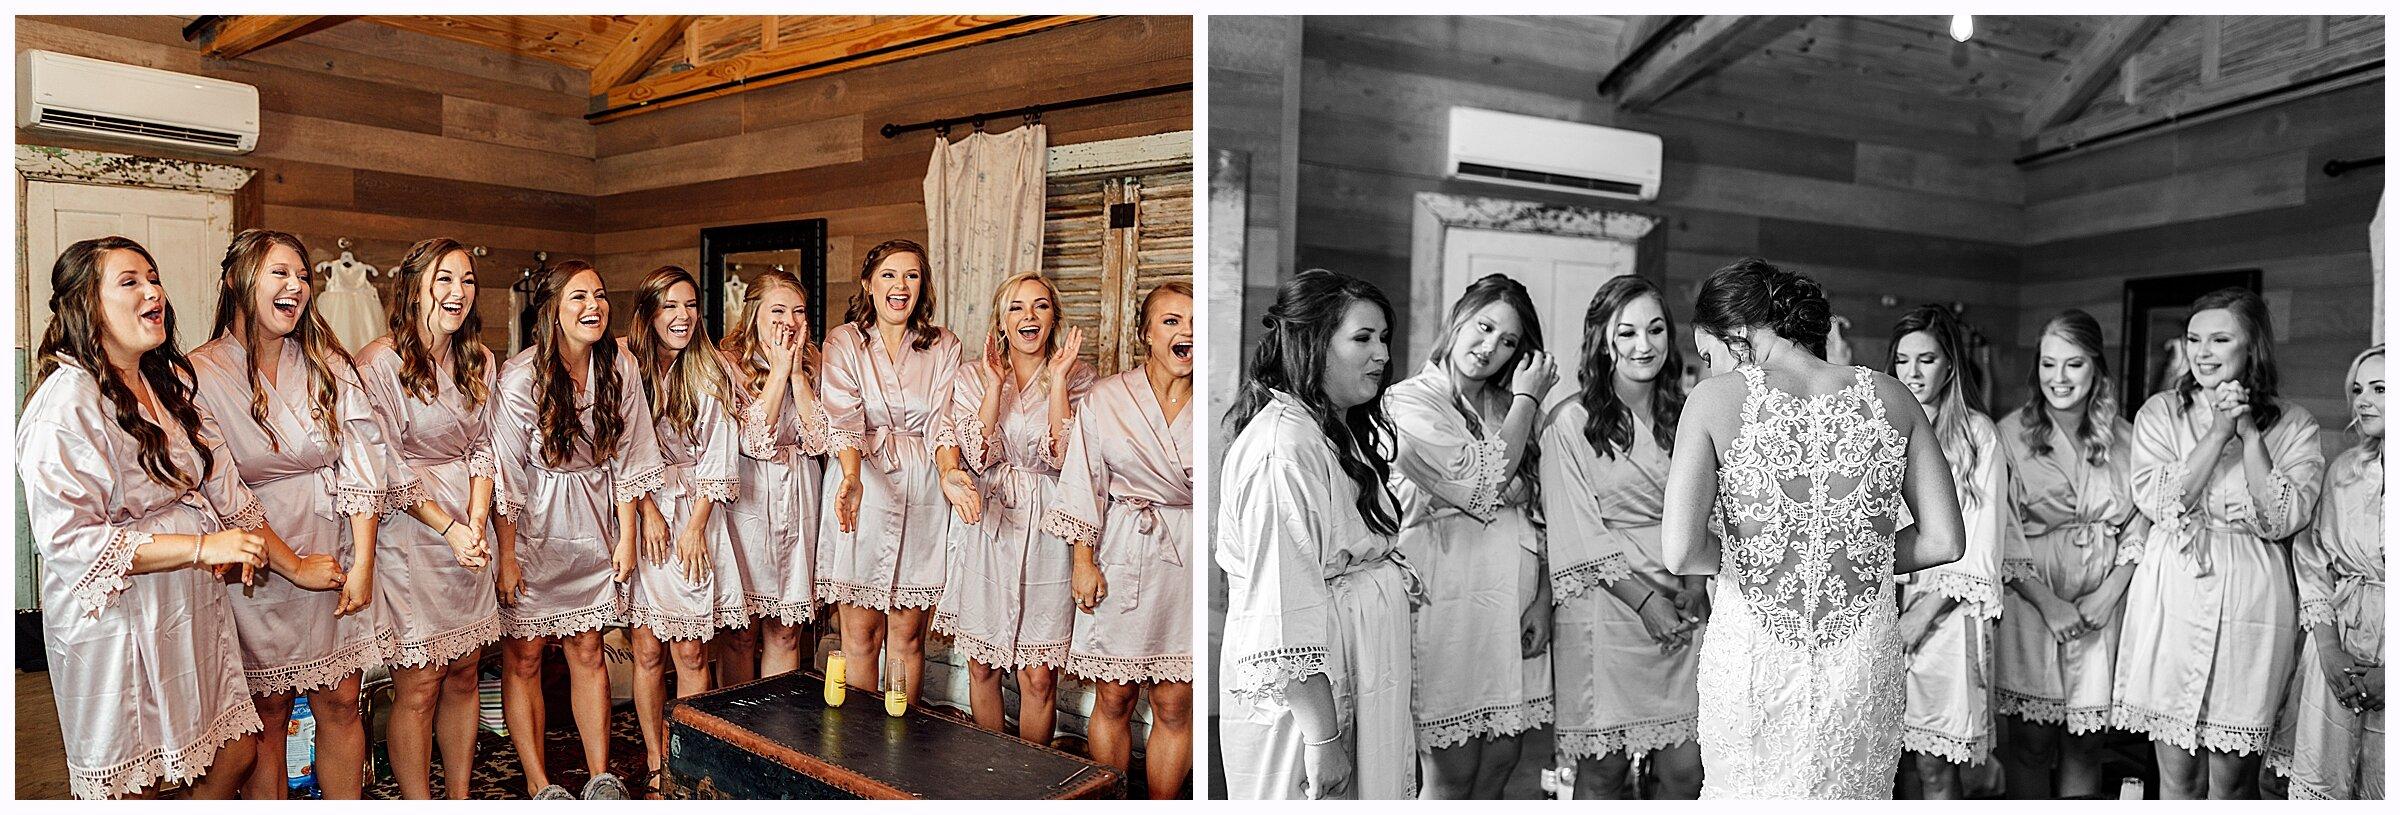 lindsey ann photography, barn at shady lane, barn at shady lane wedding, birmingham wedding photographer, alabama wedding photographer, best wedding photographer